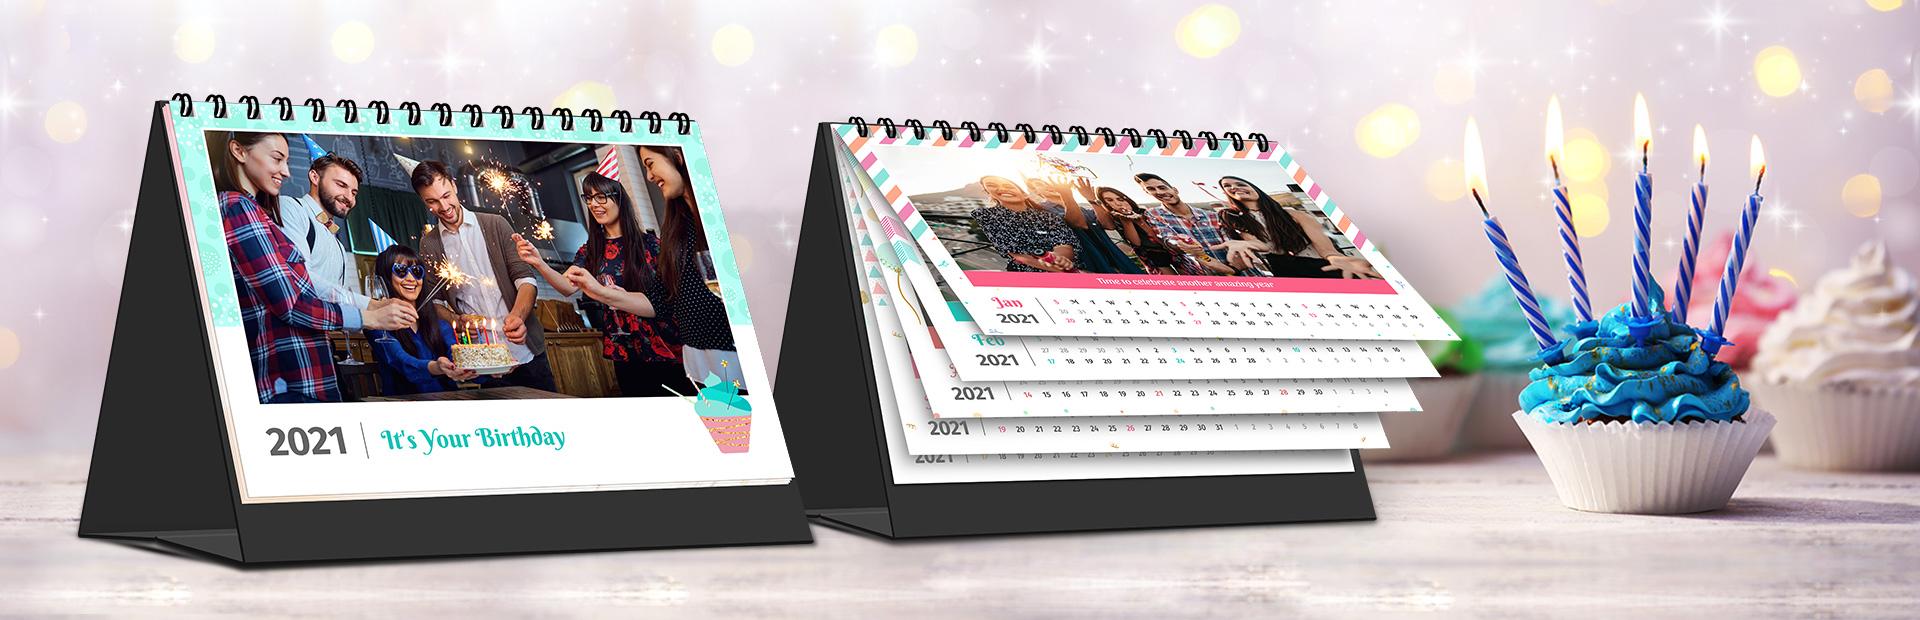 Birthday Star Photo Calendars Online